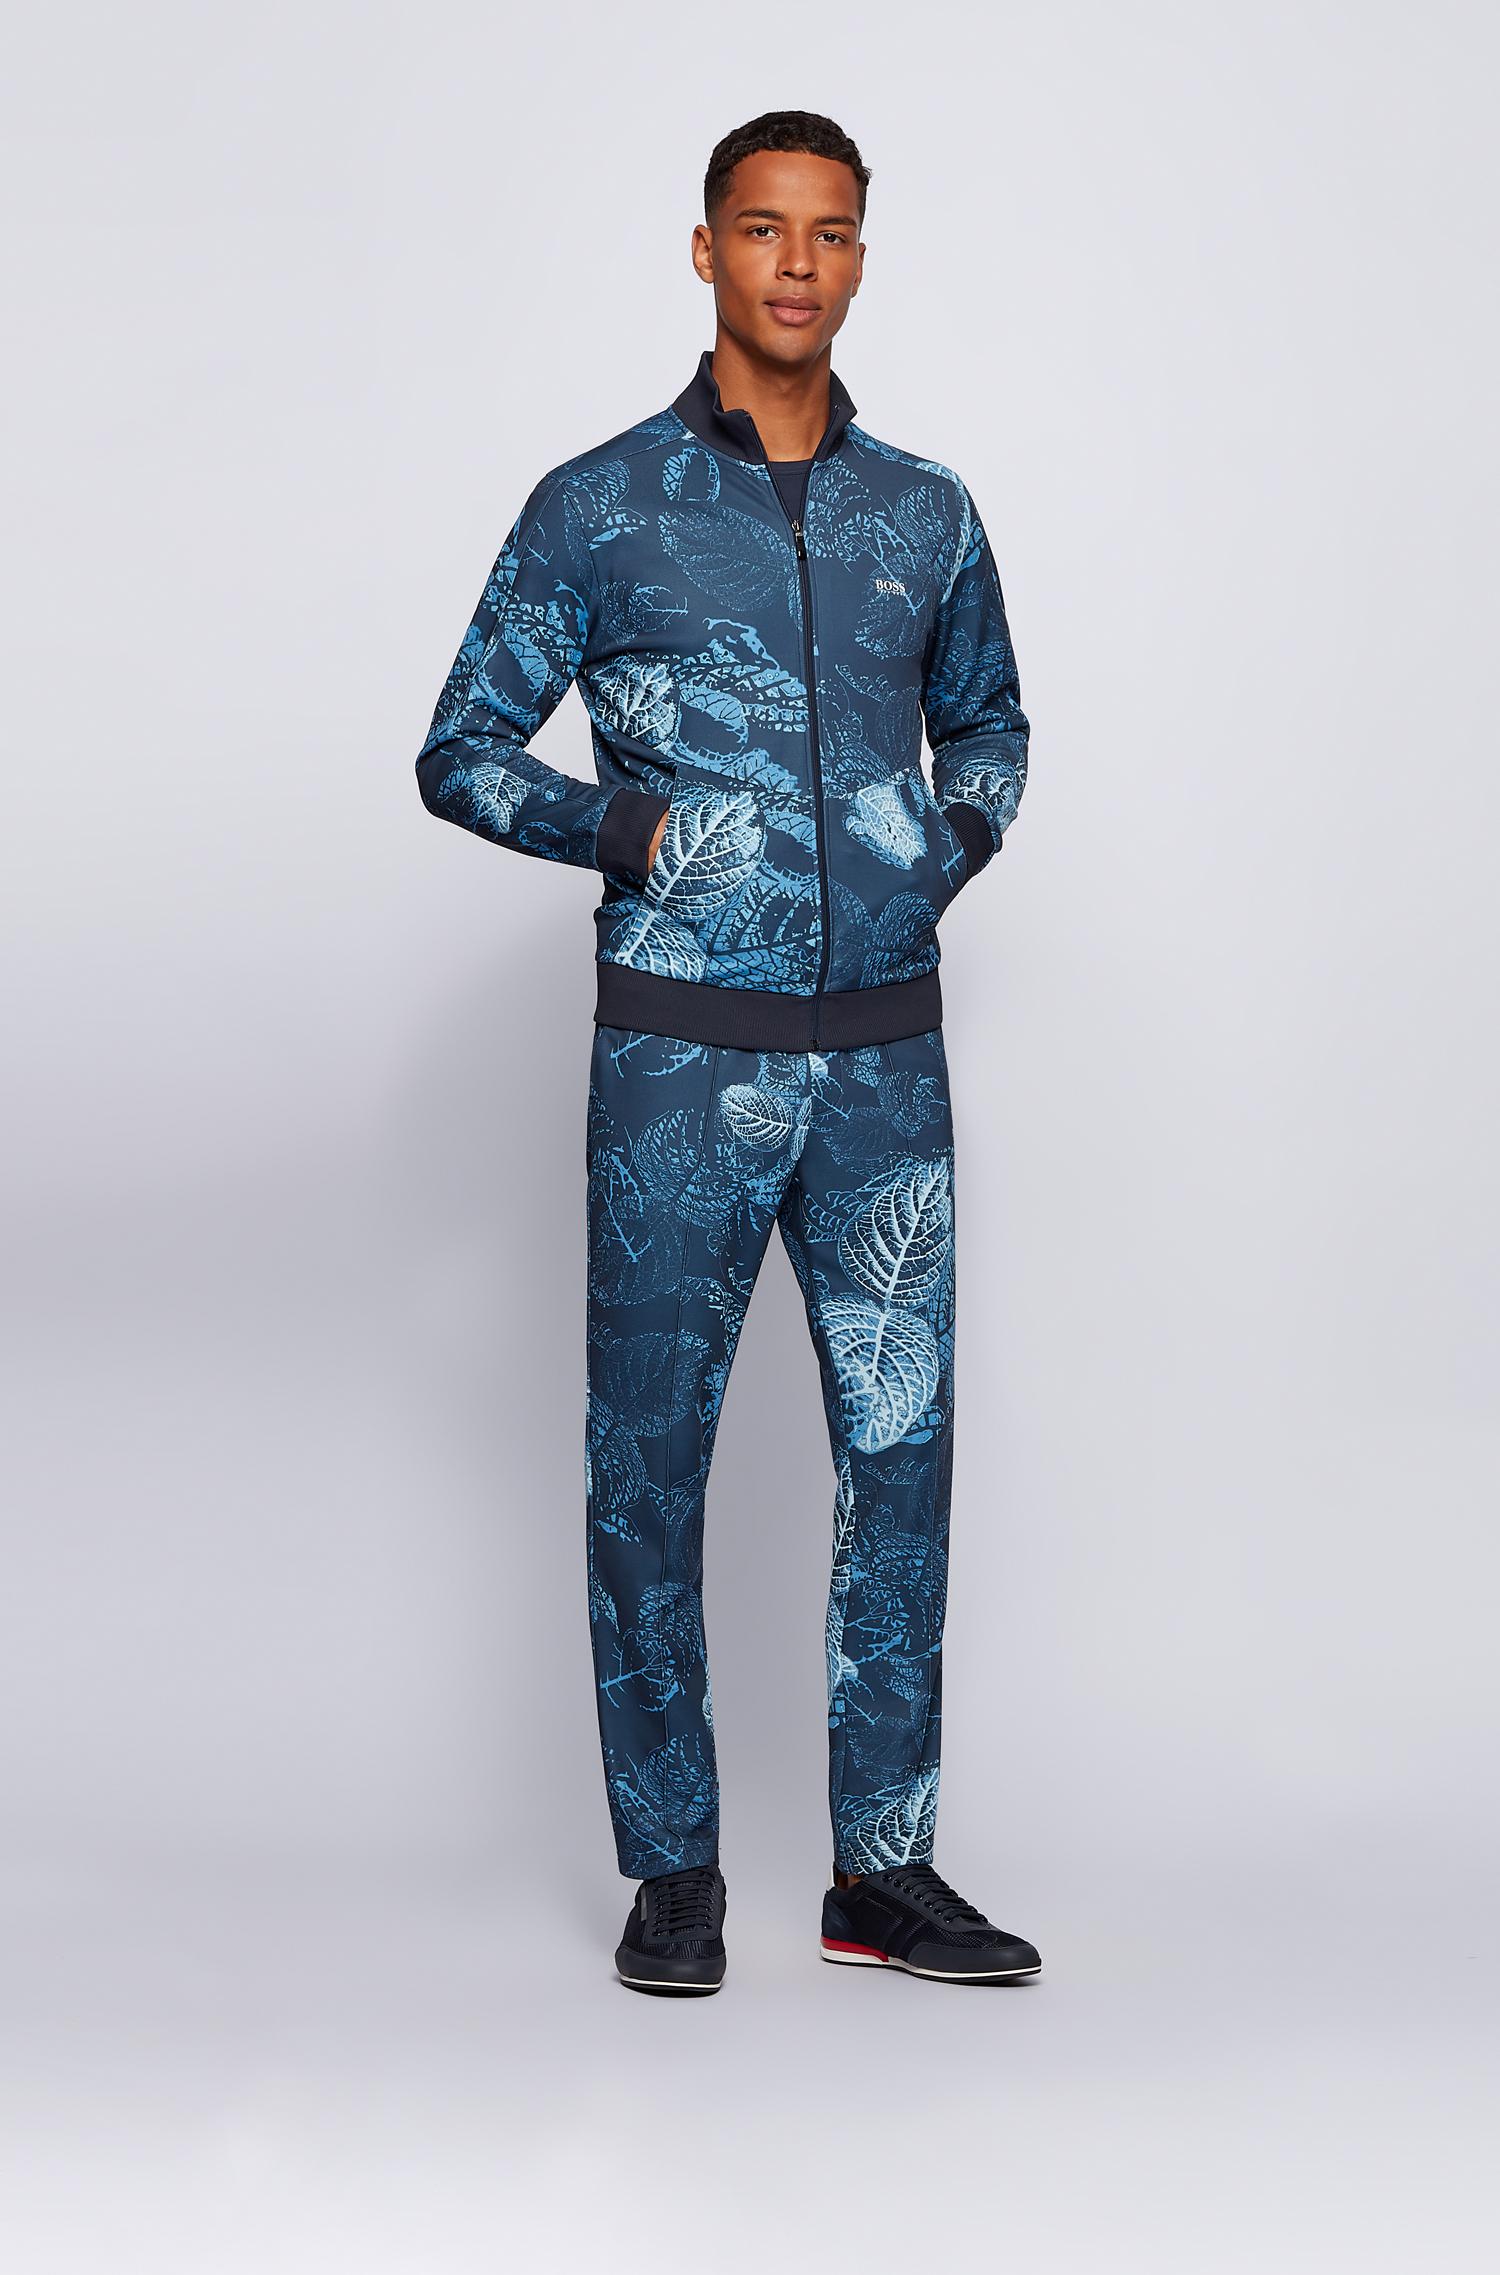 Hugo Boss Low-top sneakers, dark blue, 41